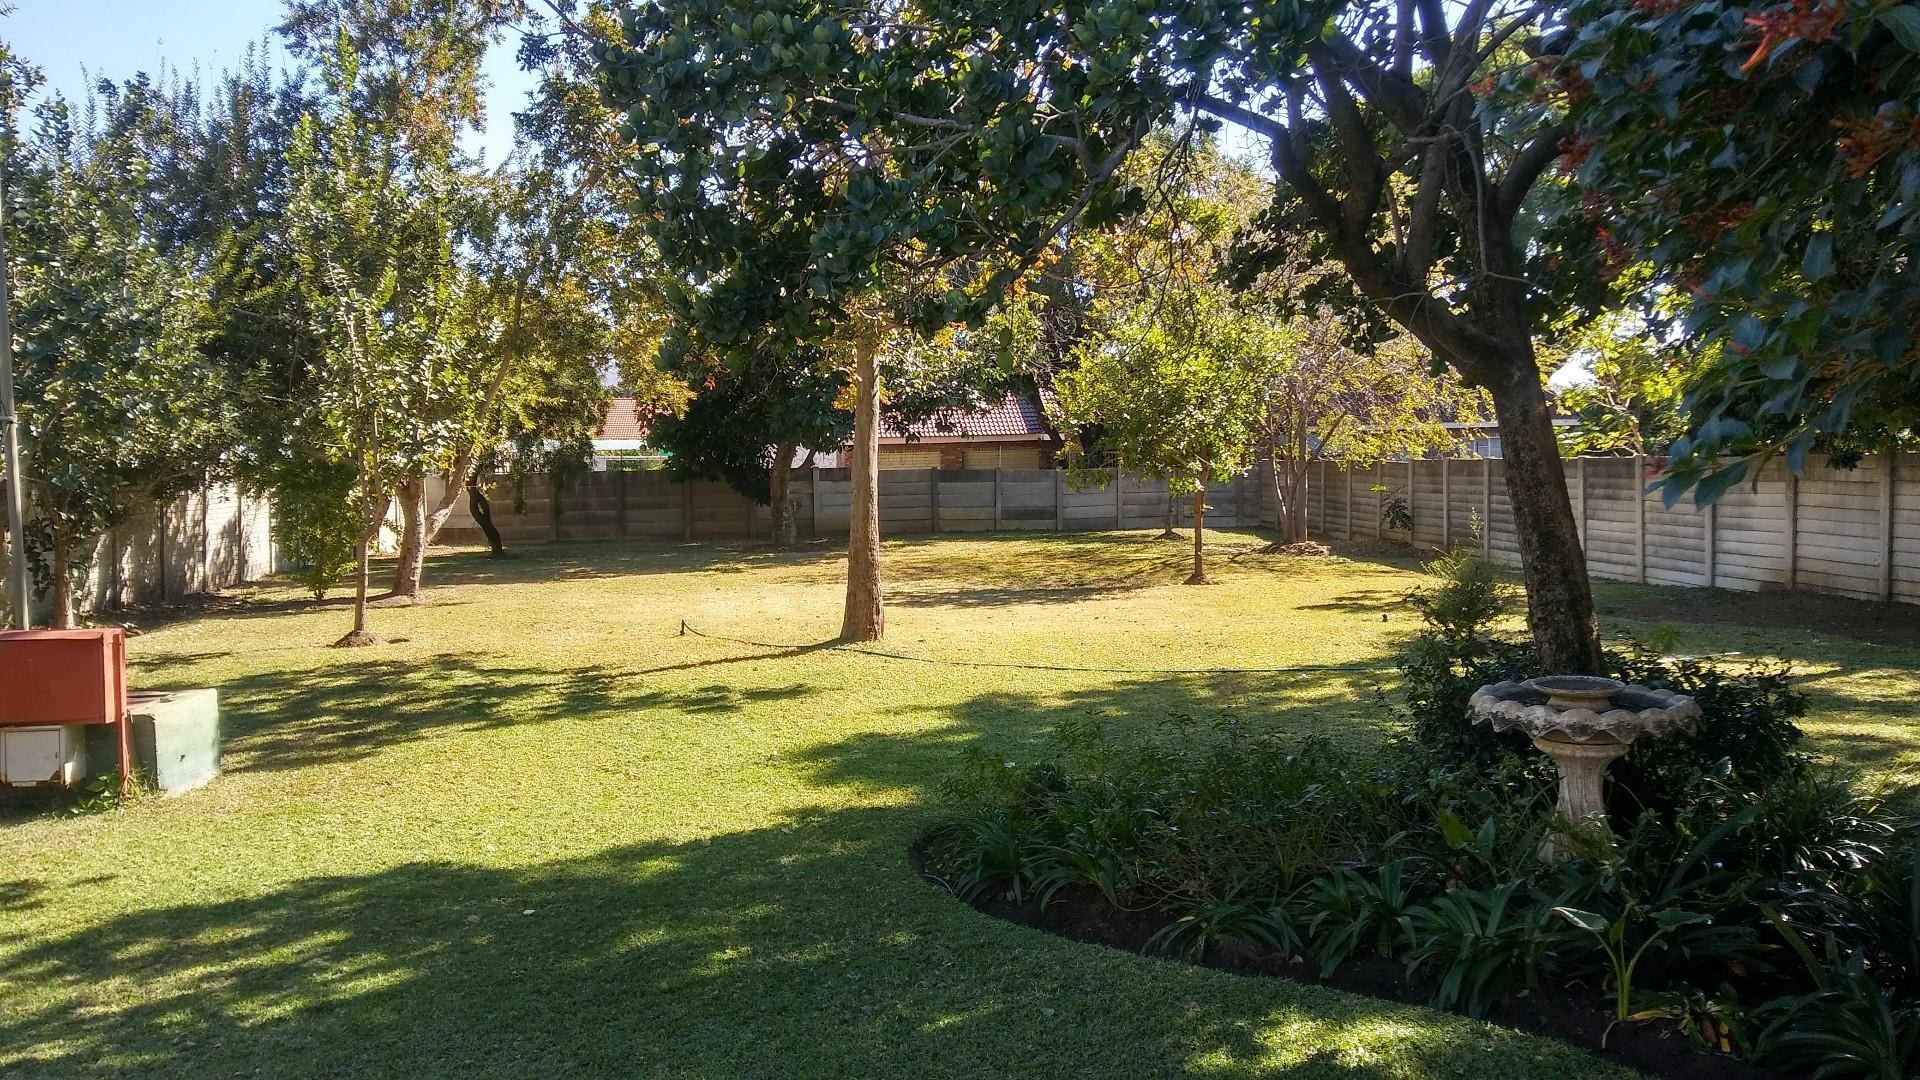 3 Bedroom House To Rent in Bo-dorp